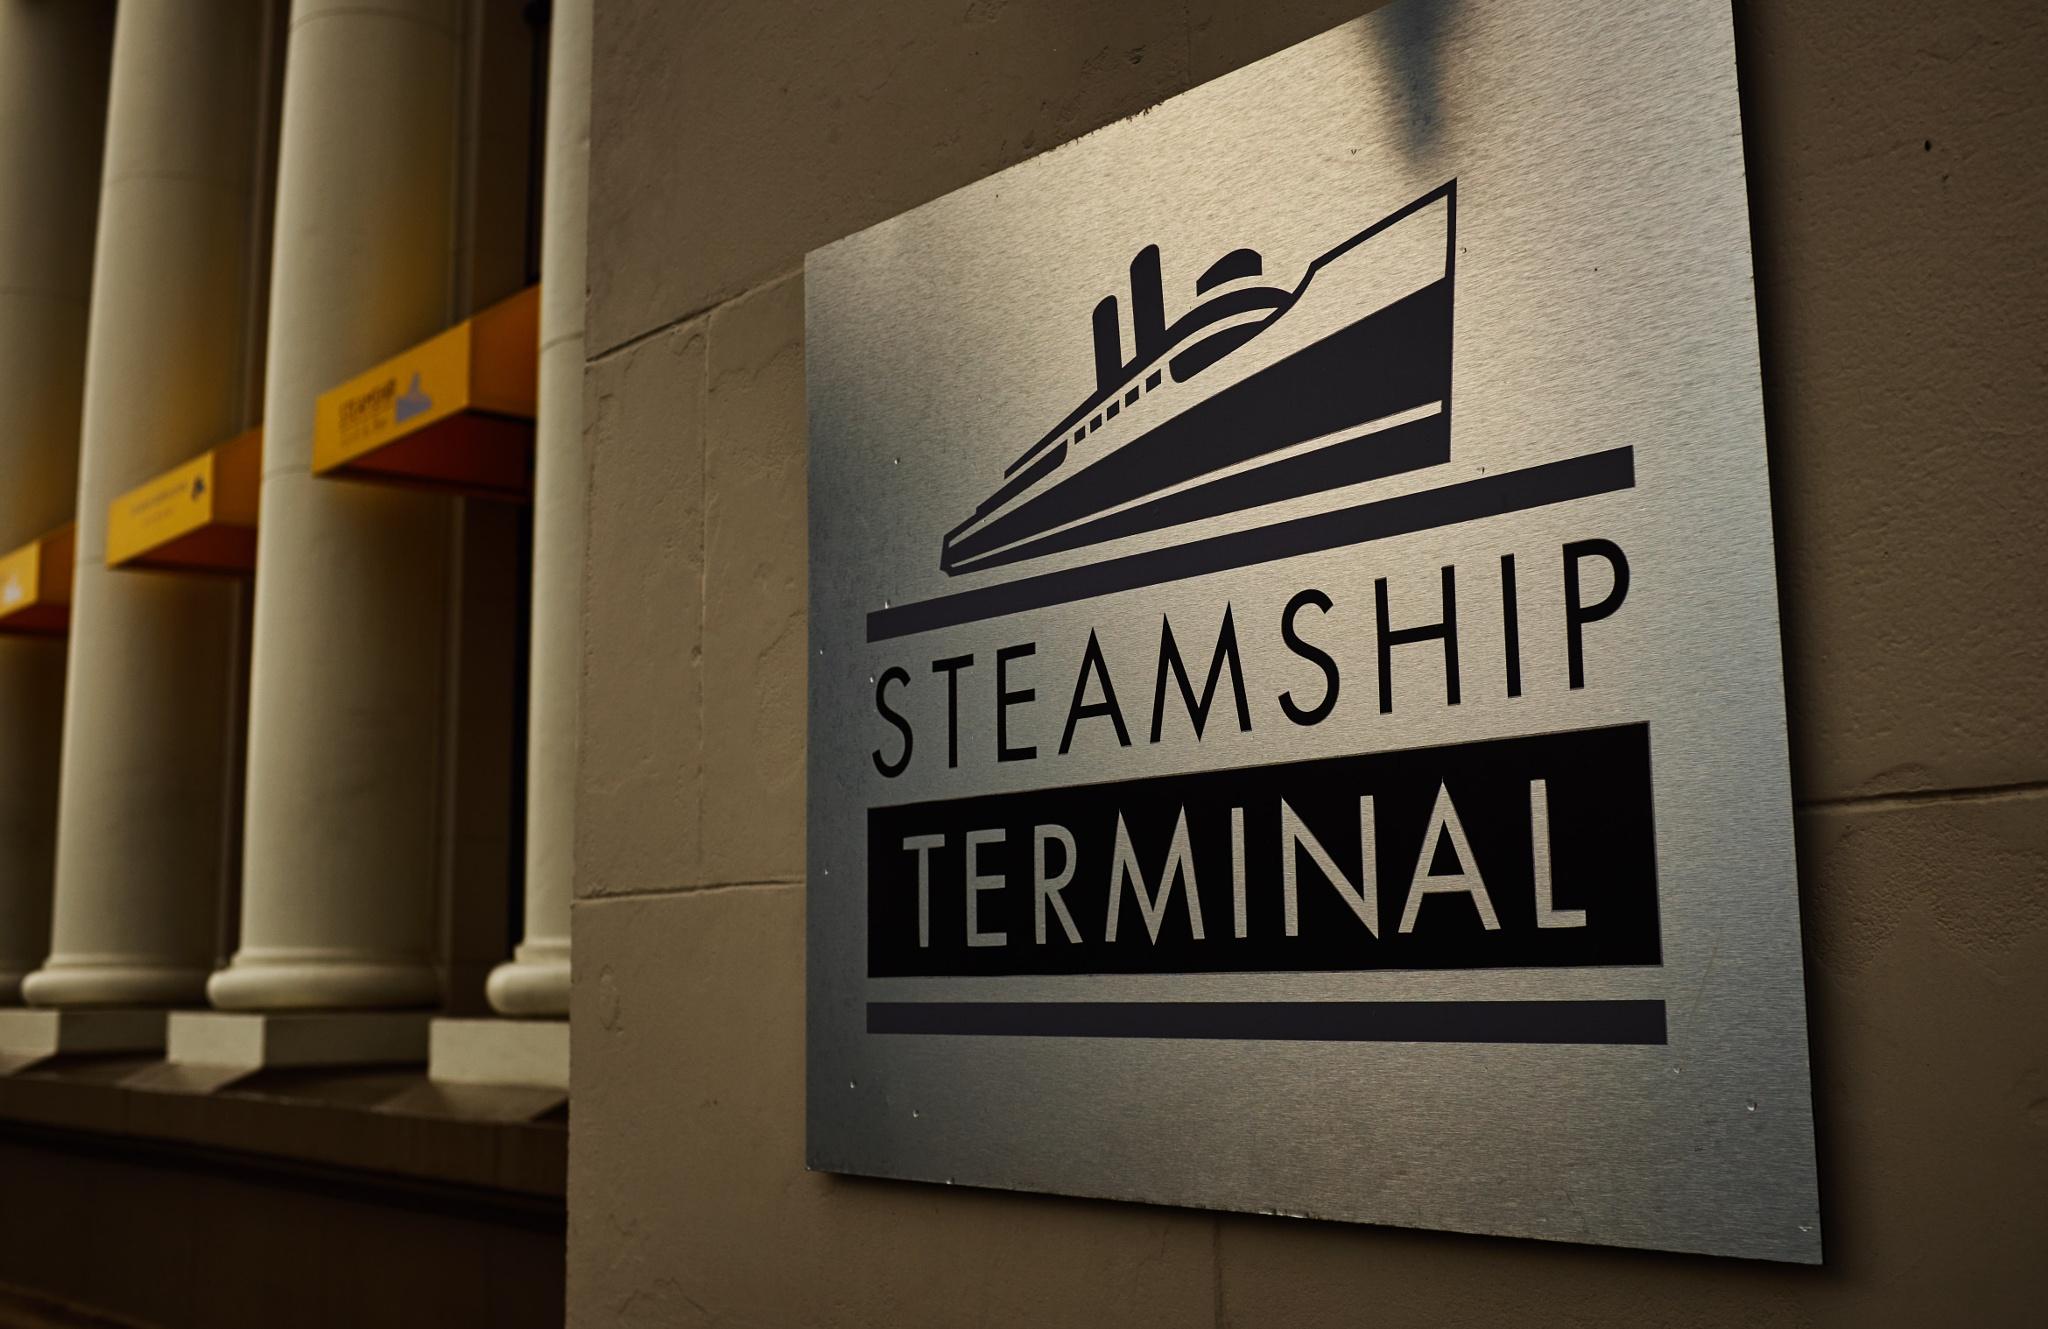 Steamship Terminal by Greg Mullaly